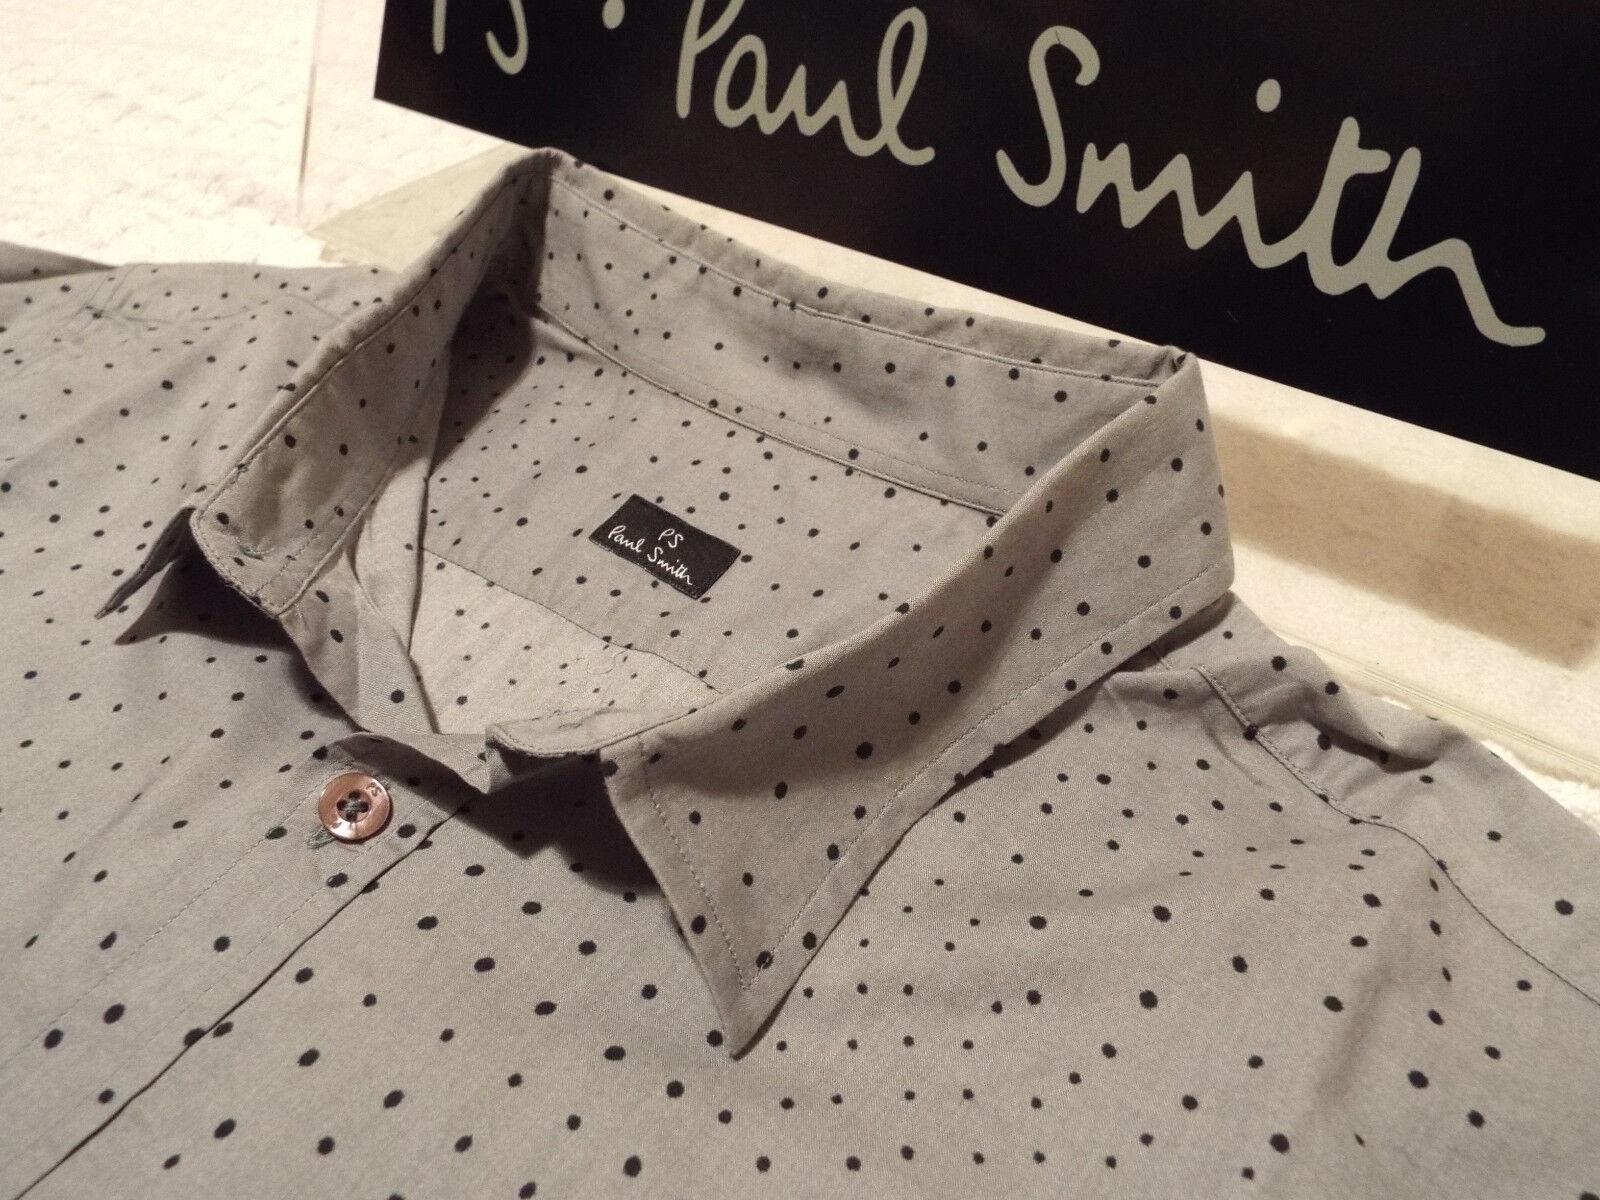 PAUL SMITH Mens Shirt  Size XL (CHEST 42 )  RRP +  IRREGULAR POLKA DOTS